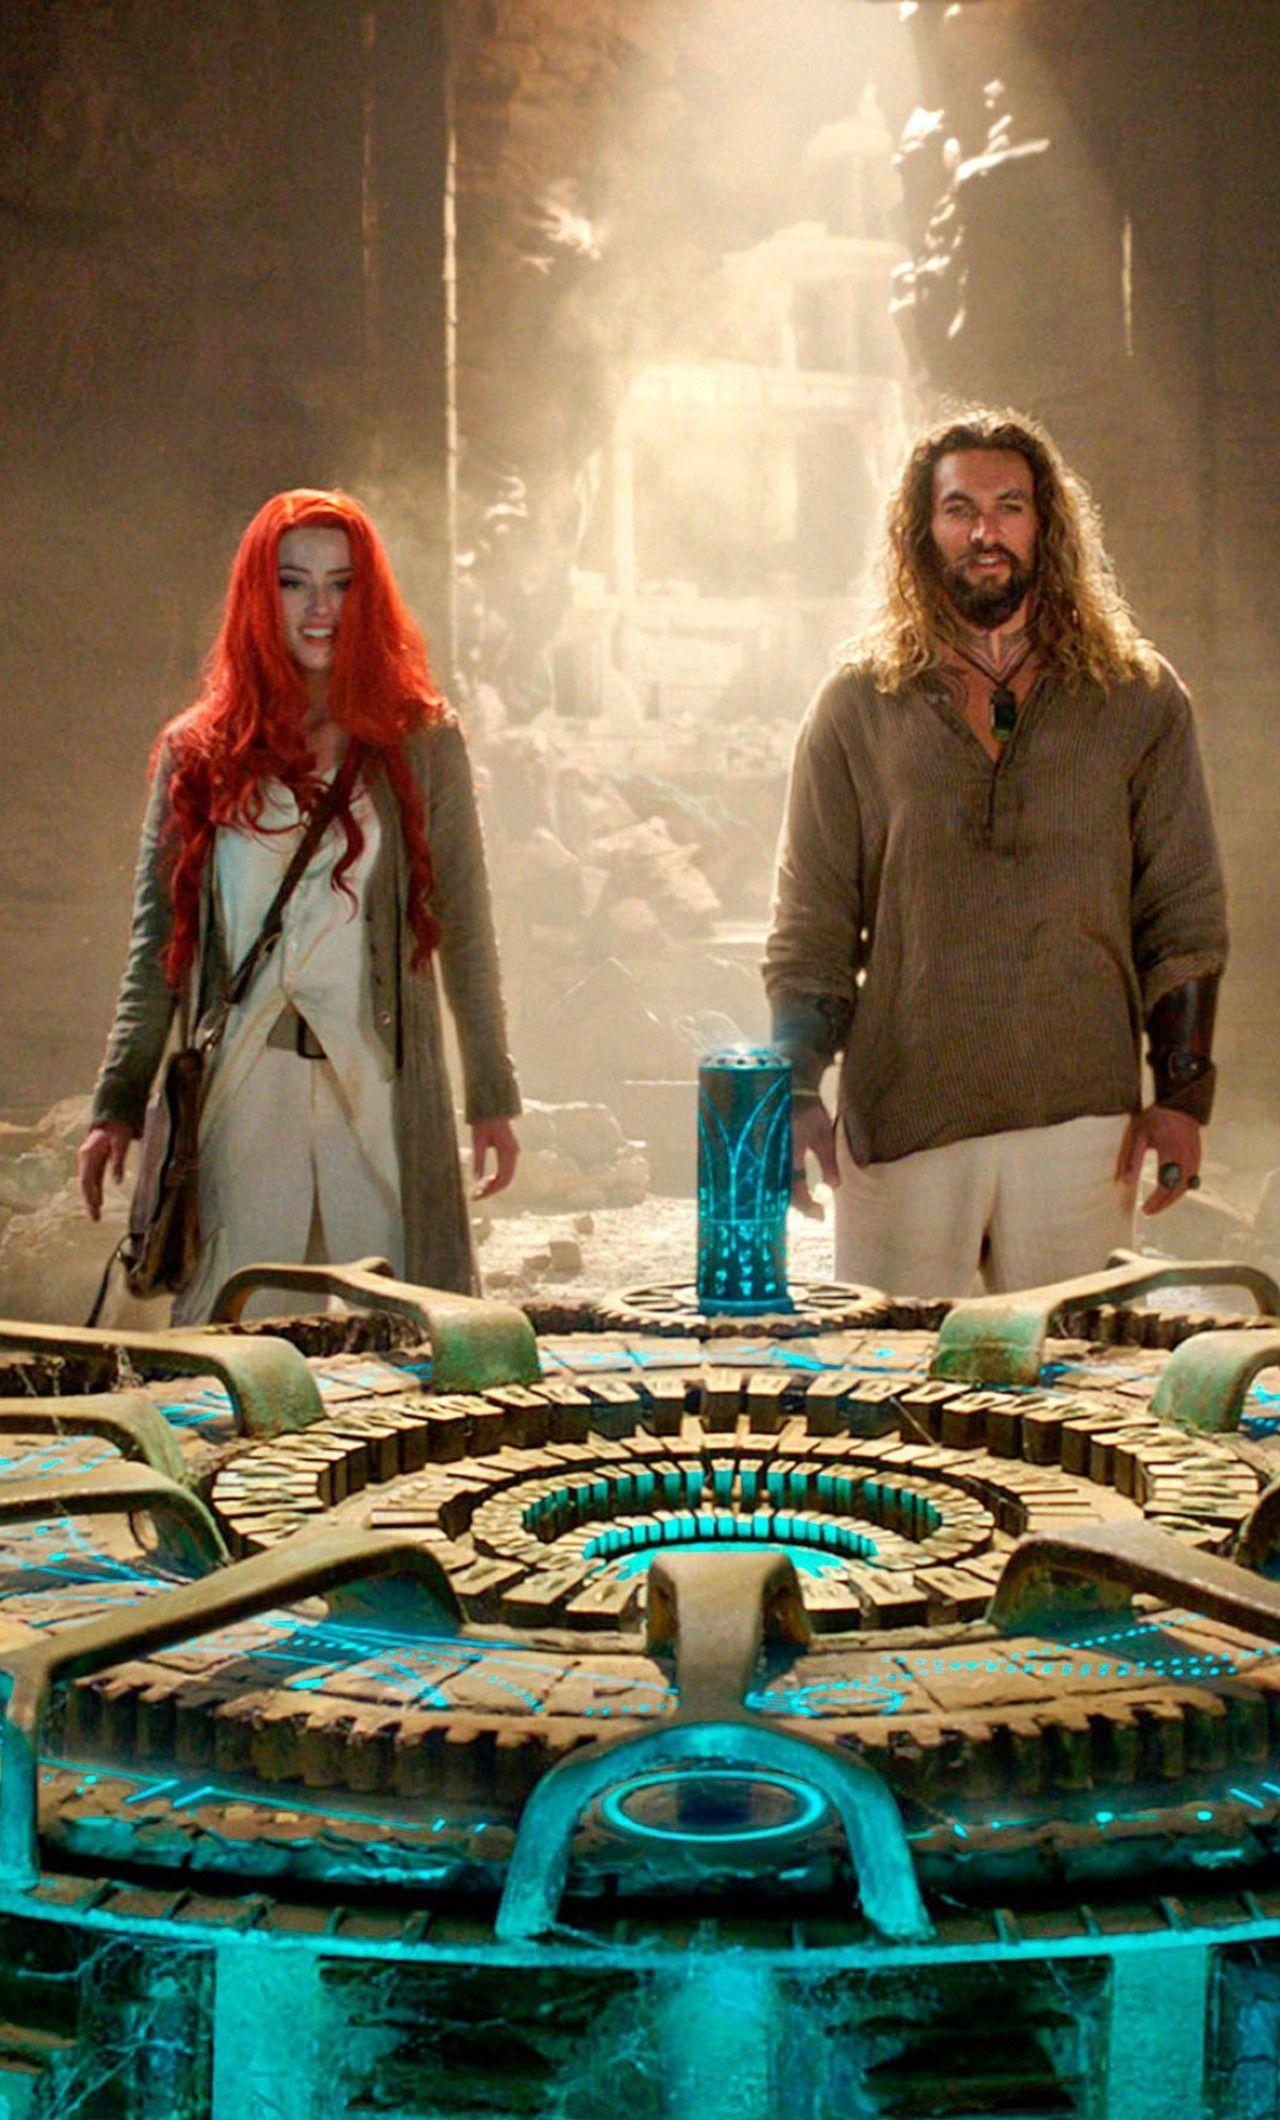 1280x2120 Aquaman And Mera Still From Movie Iphone 6 Hd 4k